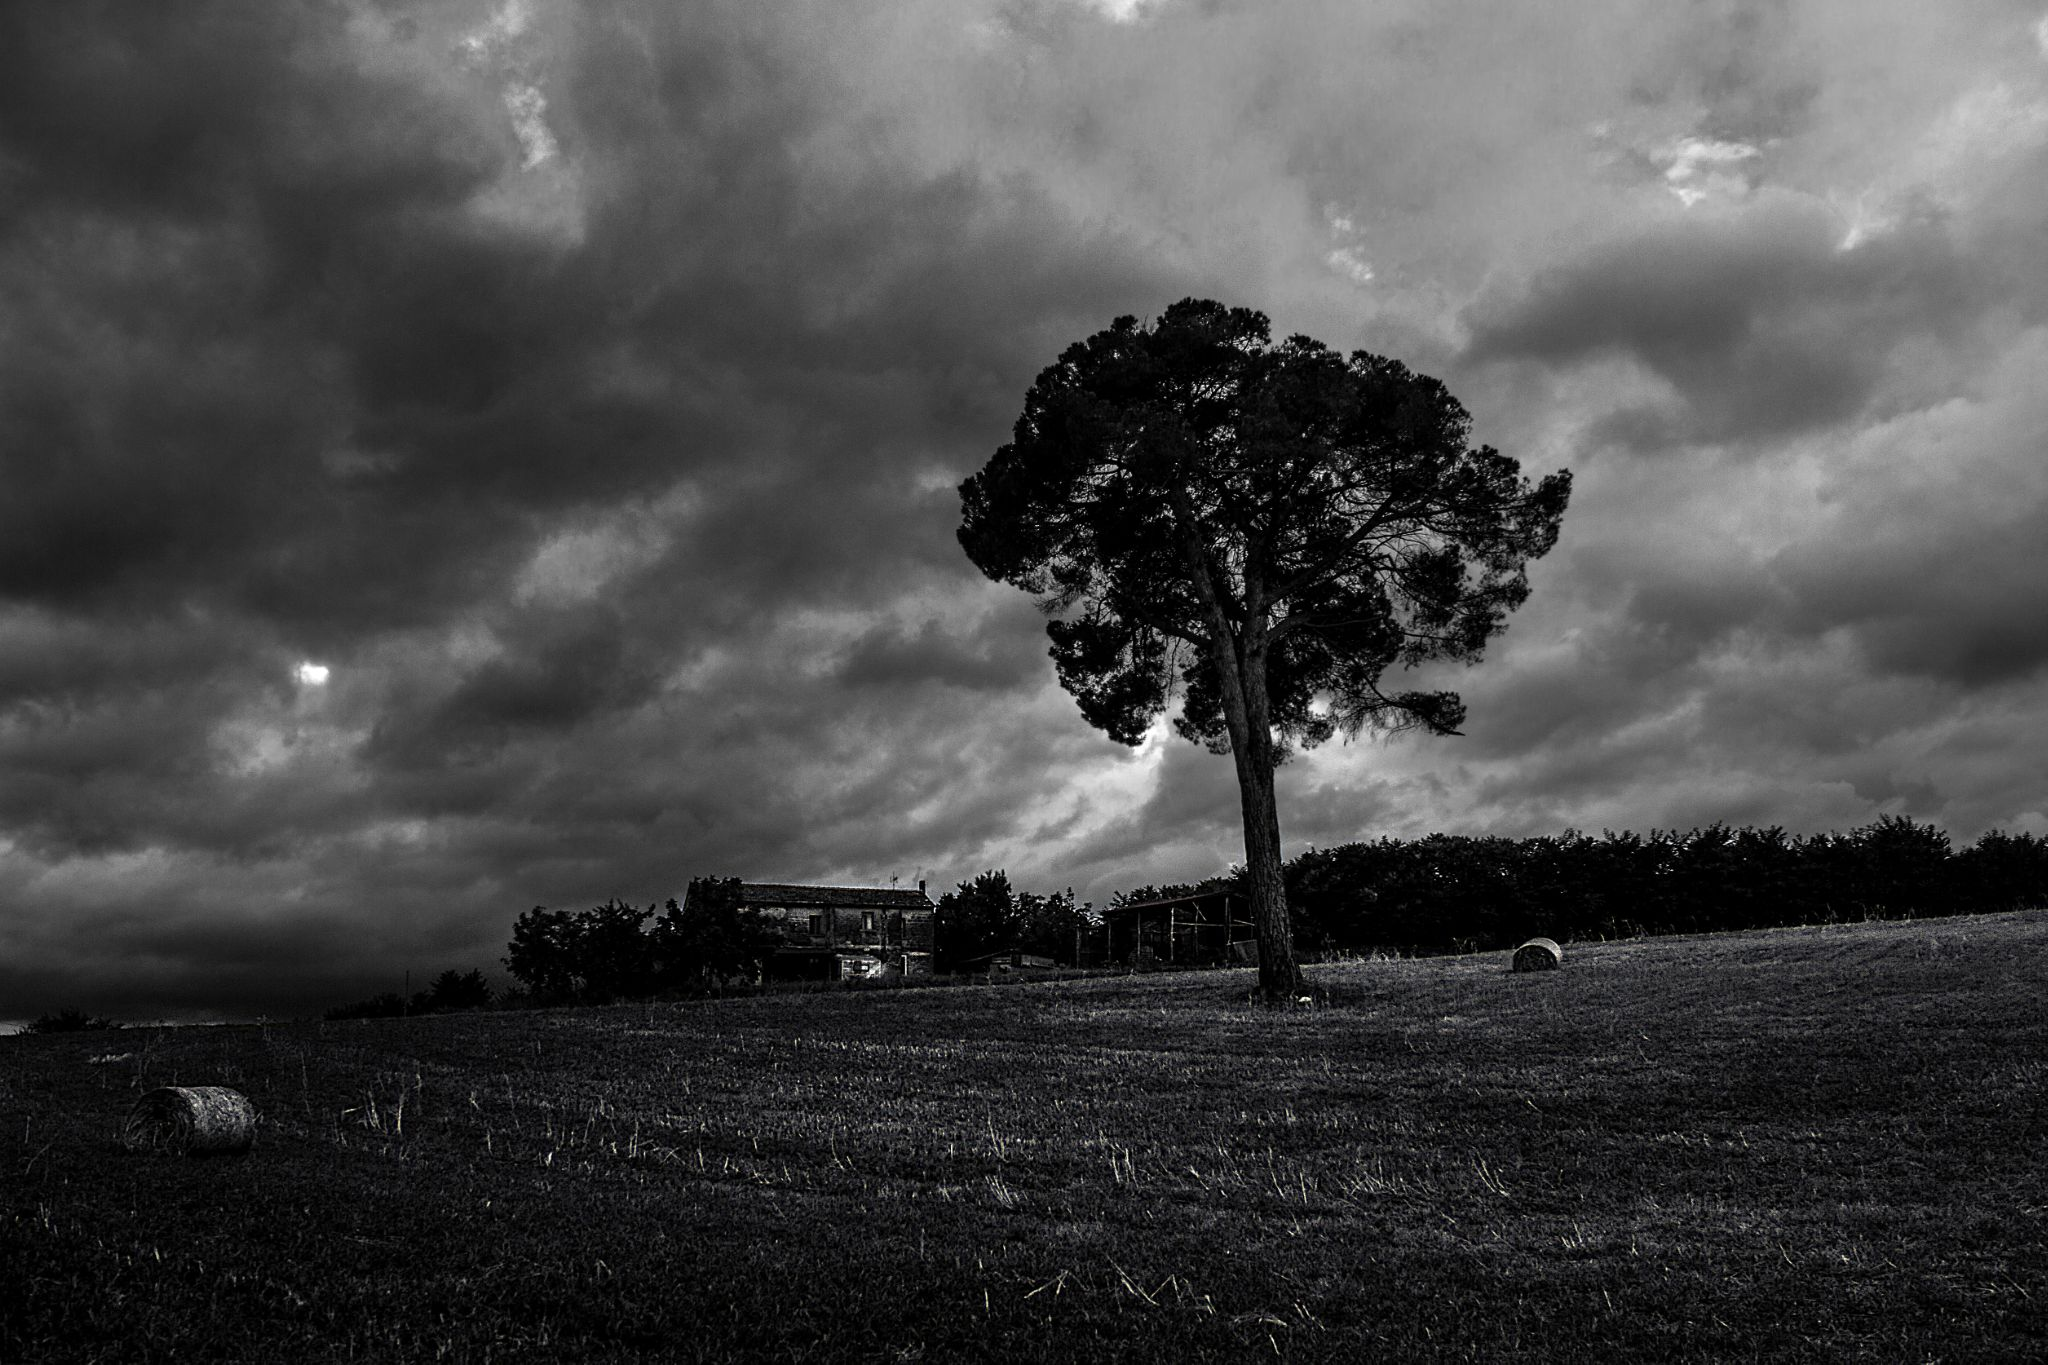 the rain over the tree by LorenzoRocco